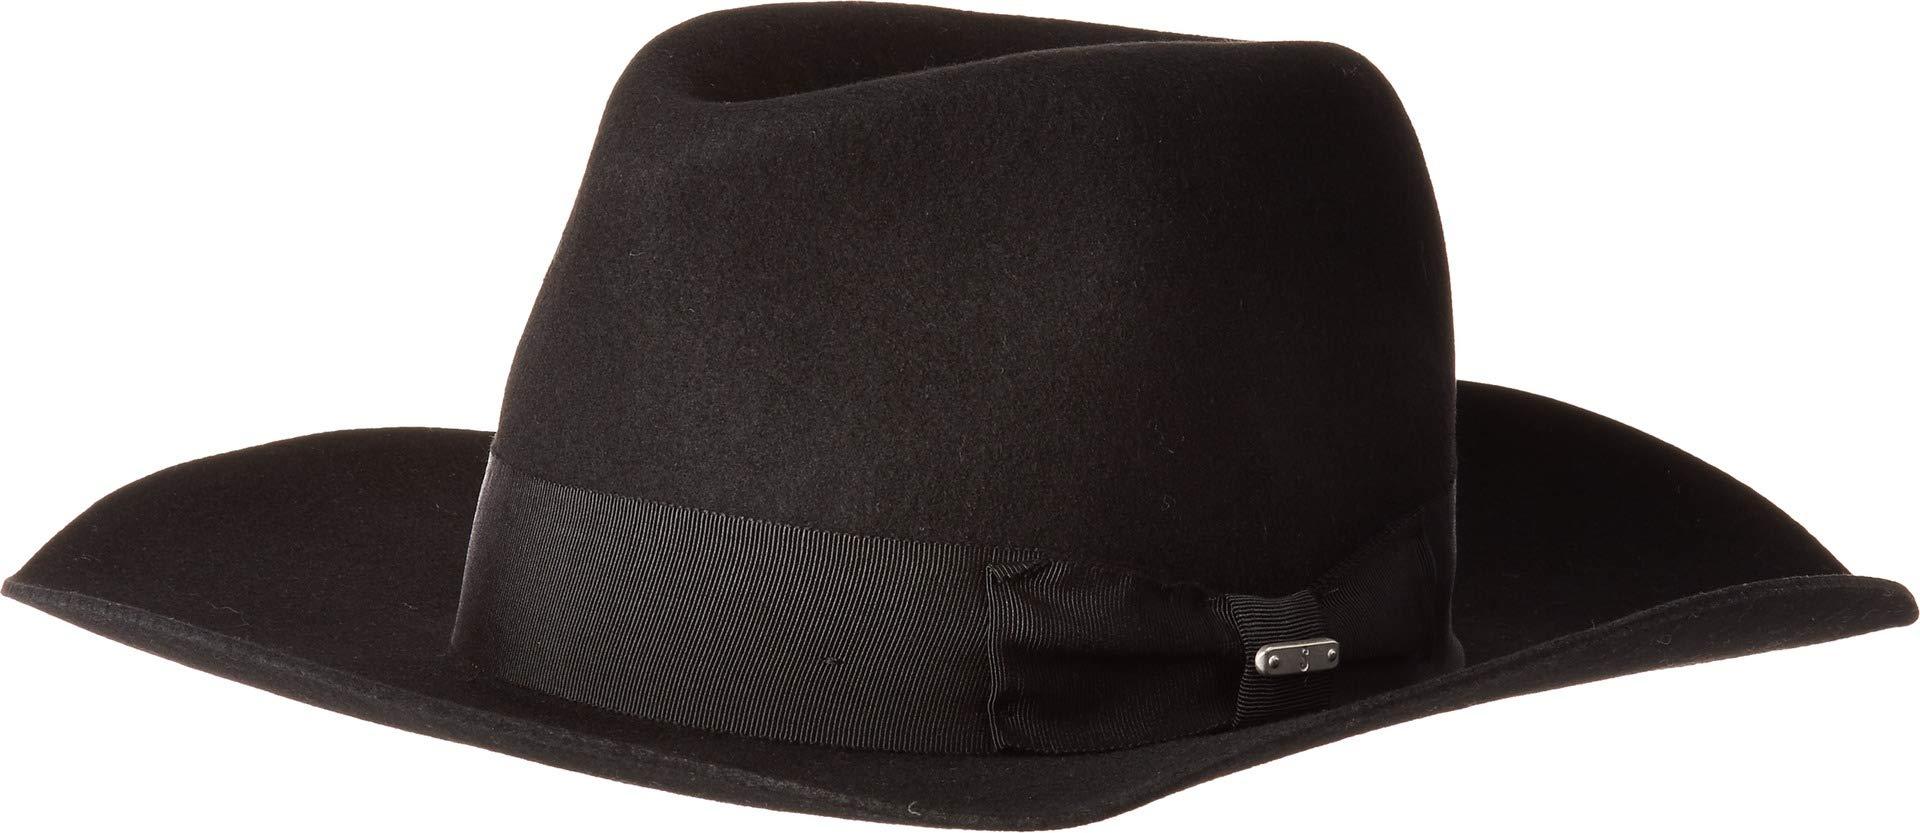 San Diego Hat Company Women's Wide Flat Brim Fedora Hat, Black, One Size